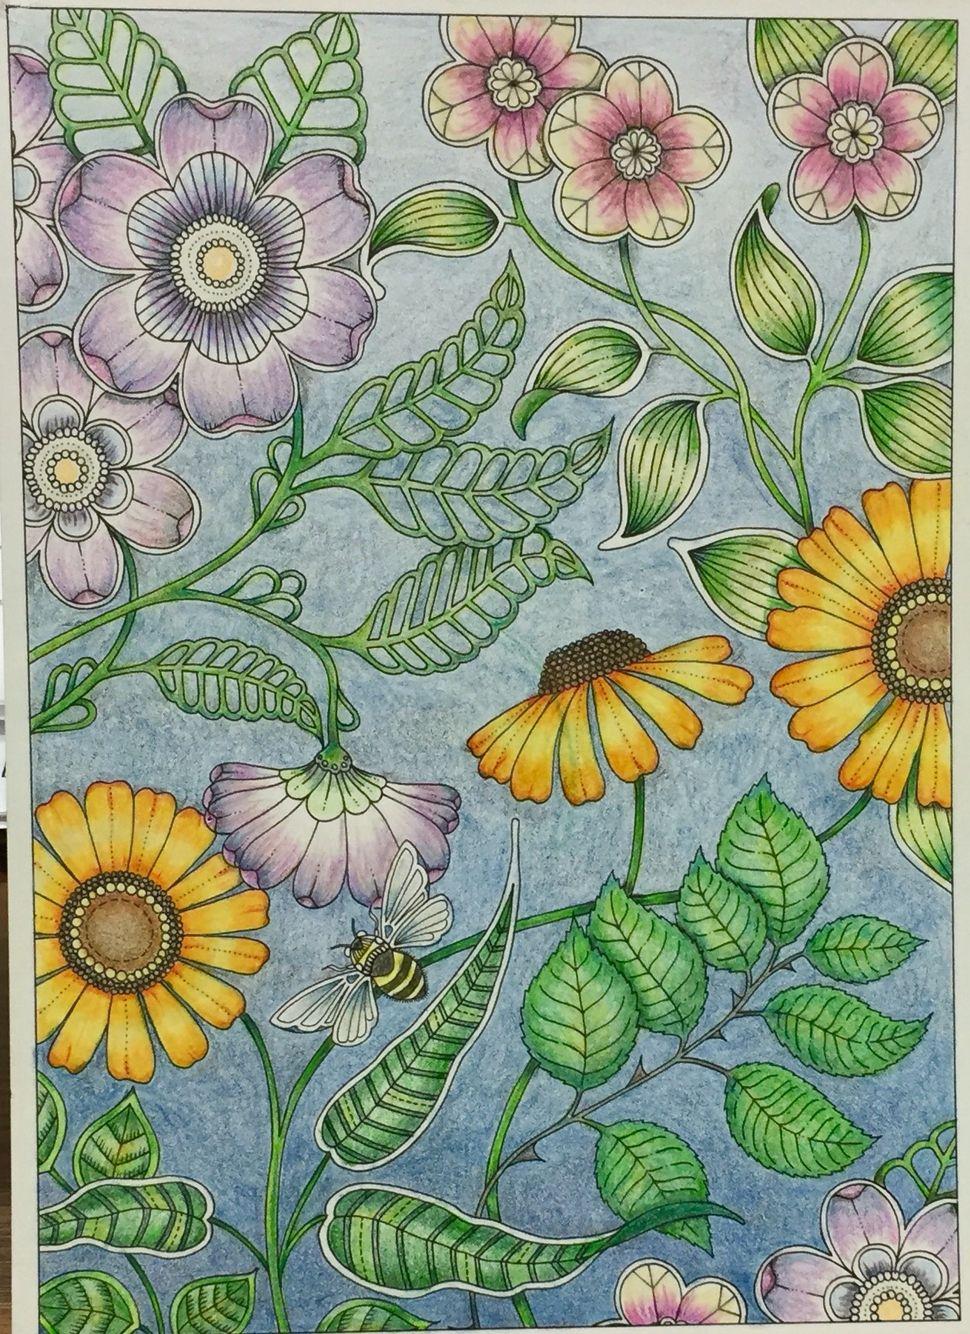 From Joanna Basford S Secret Garden Postcard Book Just Finished Secret Garden Coloring Book Secret Garden Colouring Secret Garden Coloring Book Finished